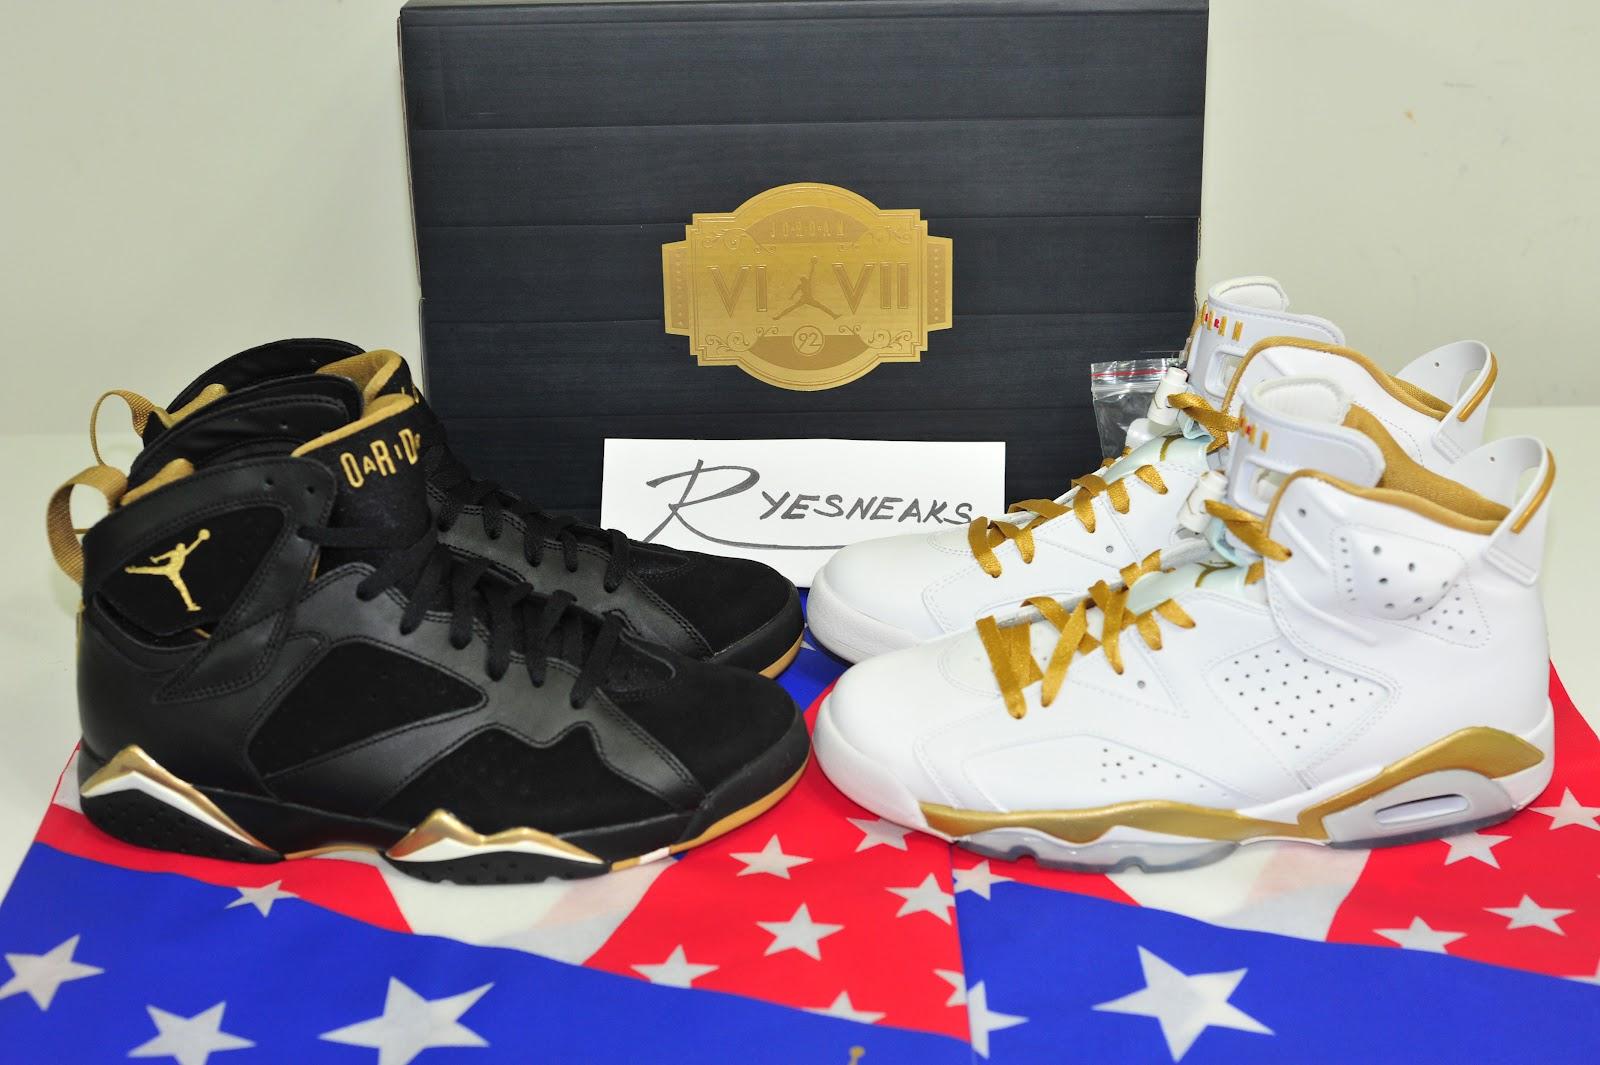 hot sale online 8efea ee261 Air Jordan VI VII  Golden Moments Pack Multi-Color Multi-Color 535357-935  08 18 12. Retail   350